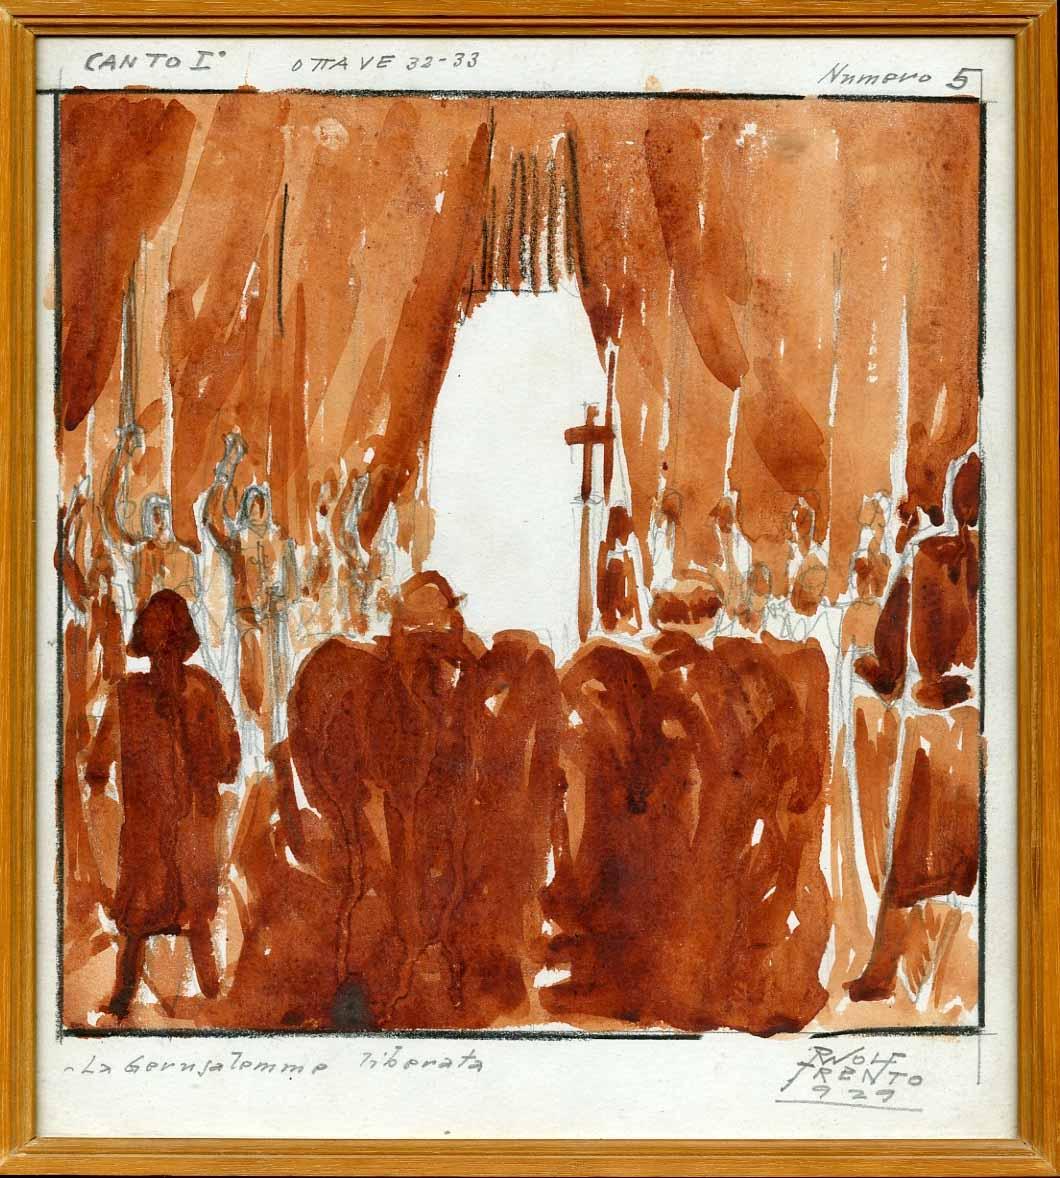 La Gerusalemme liberata, canto I, ottave 32-33, numero 5.